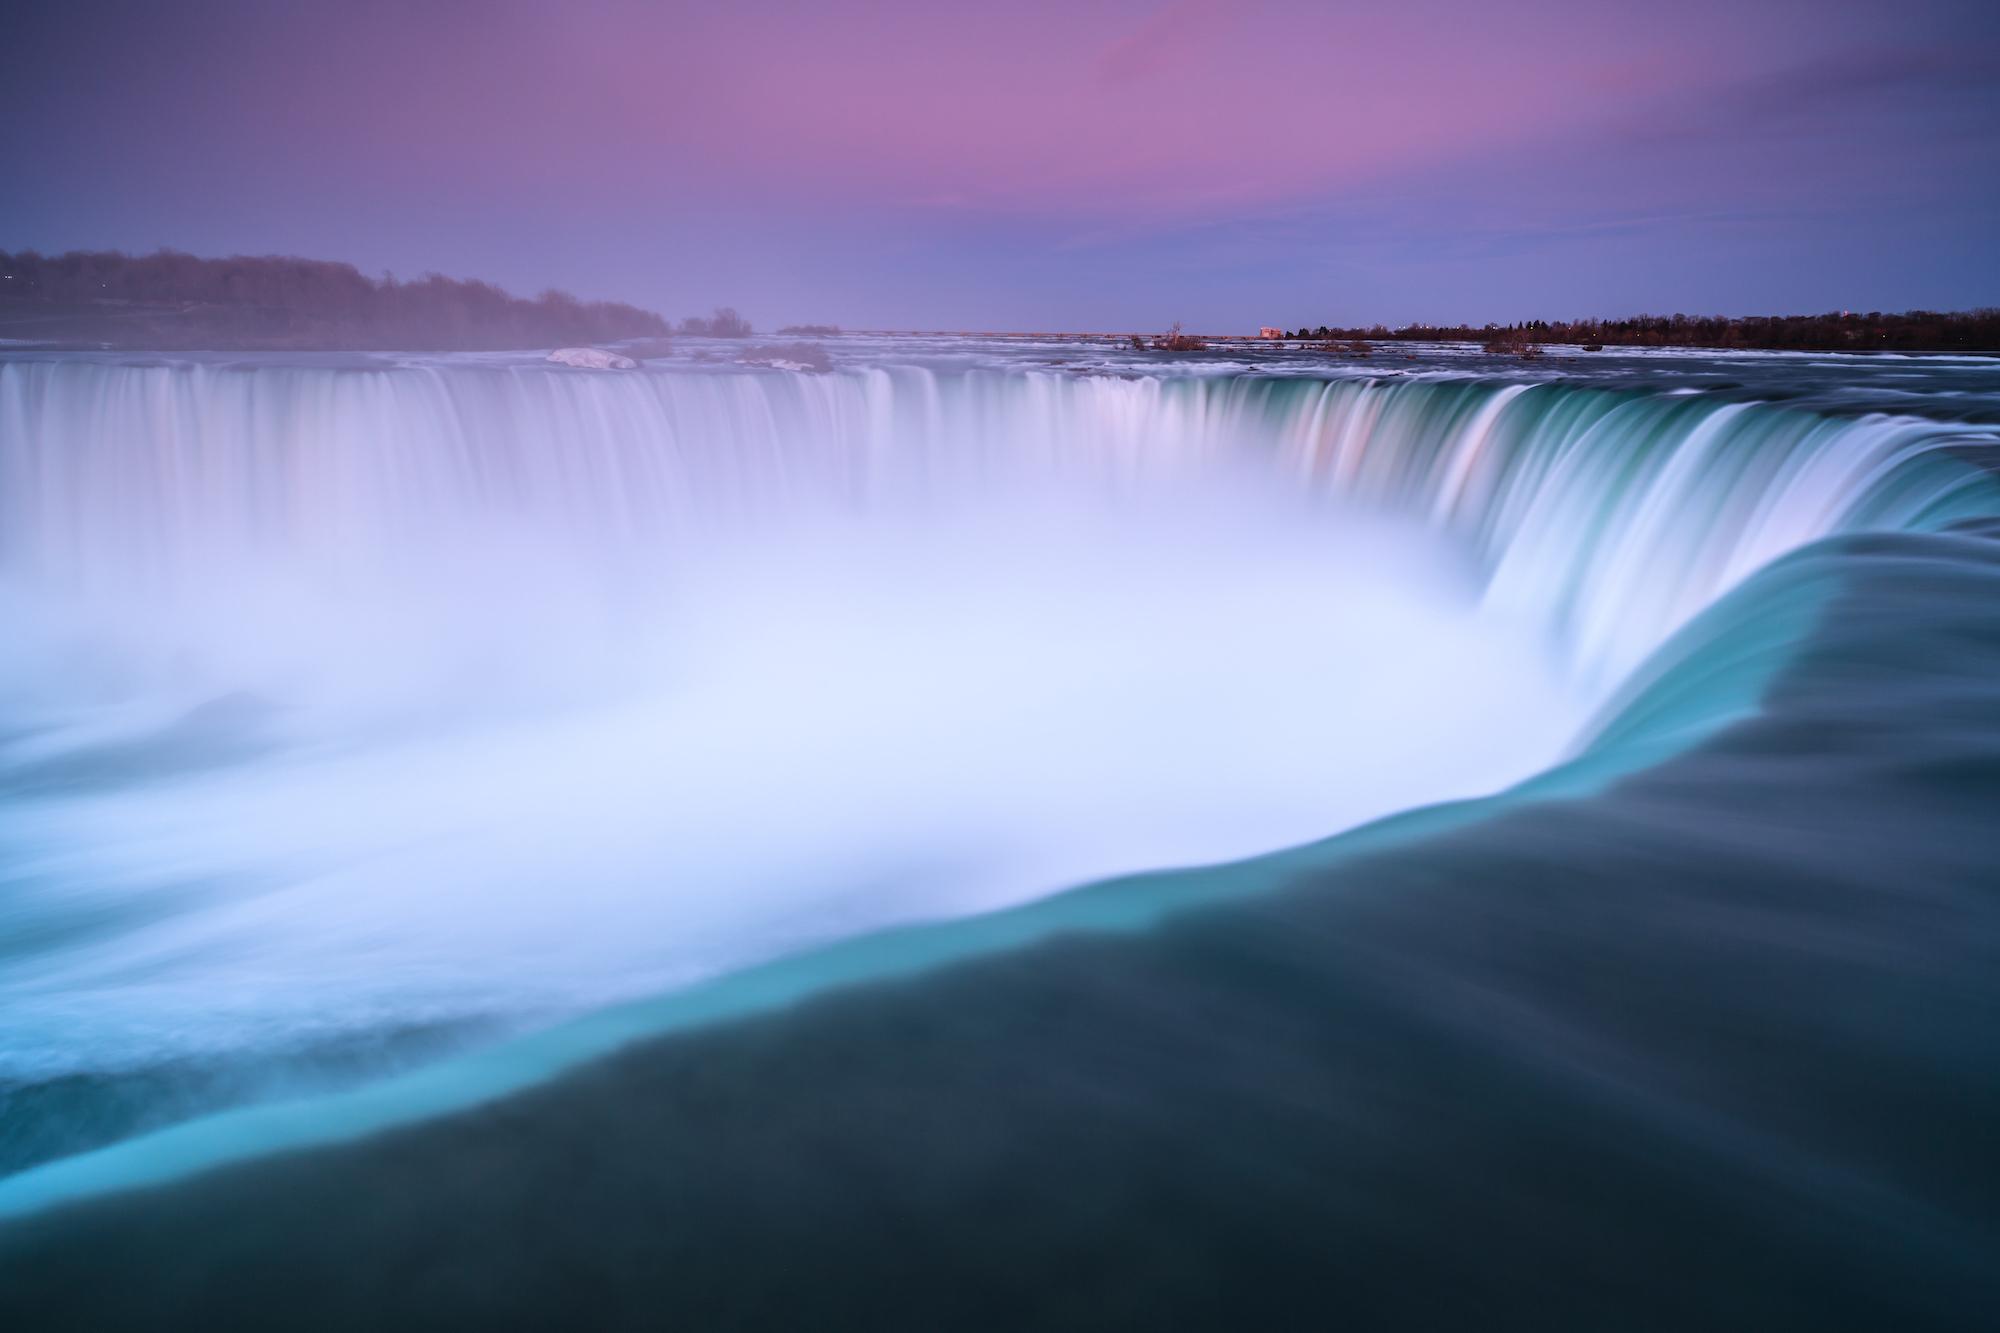 Niagara fall view during sunset example image 1